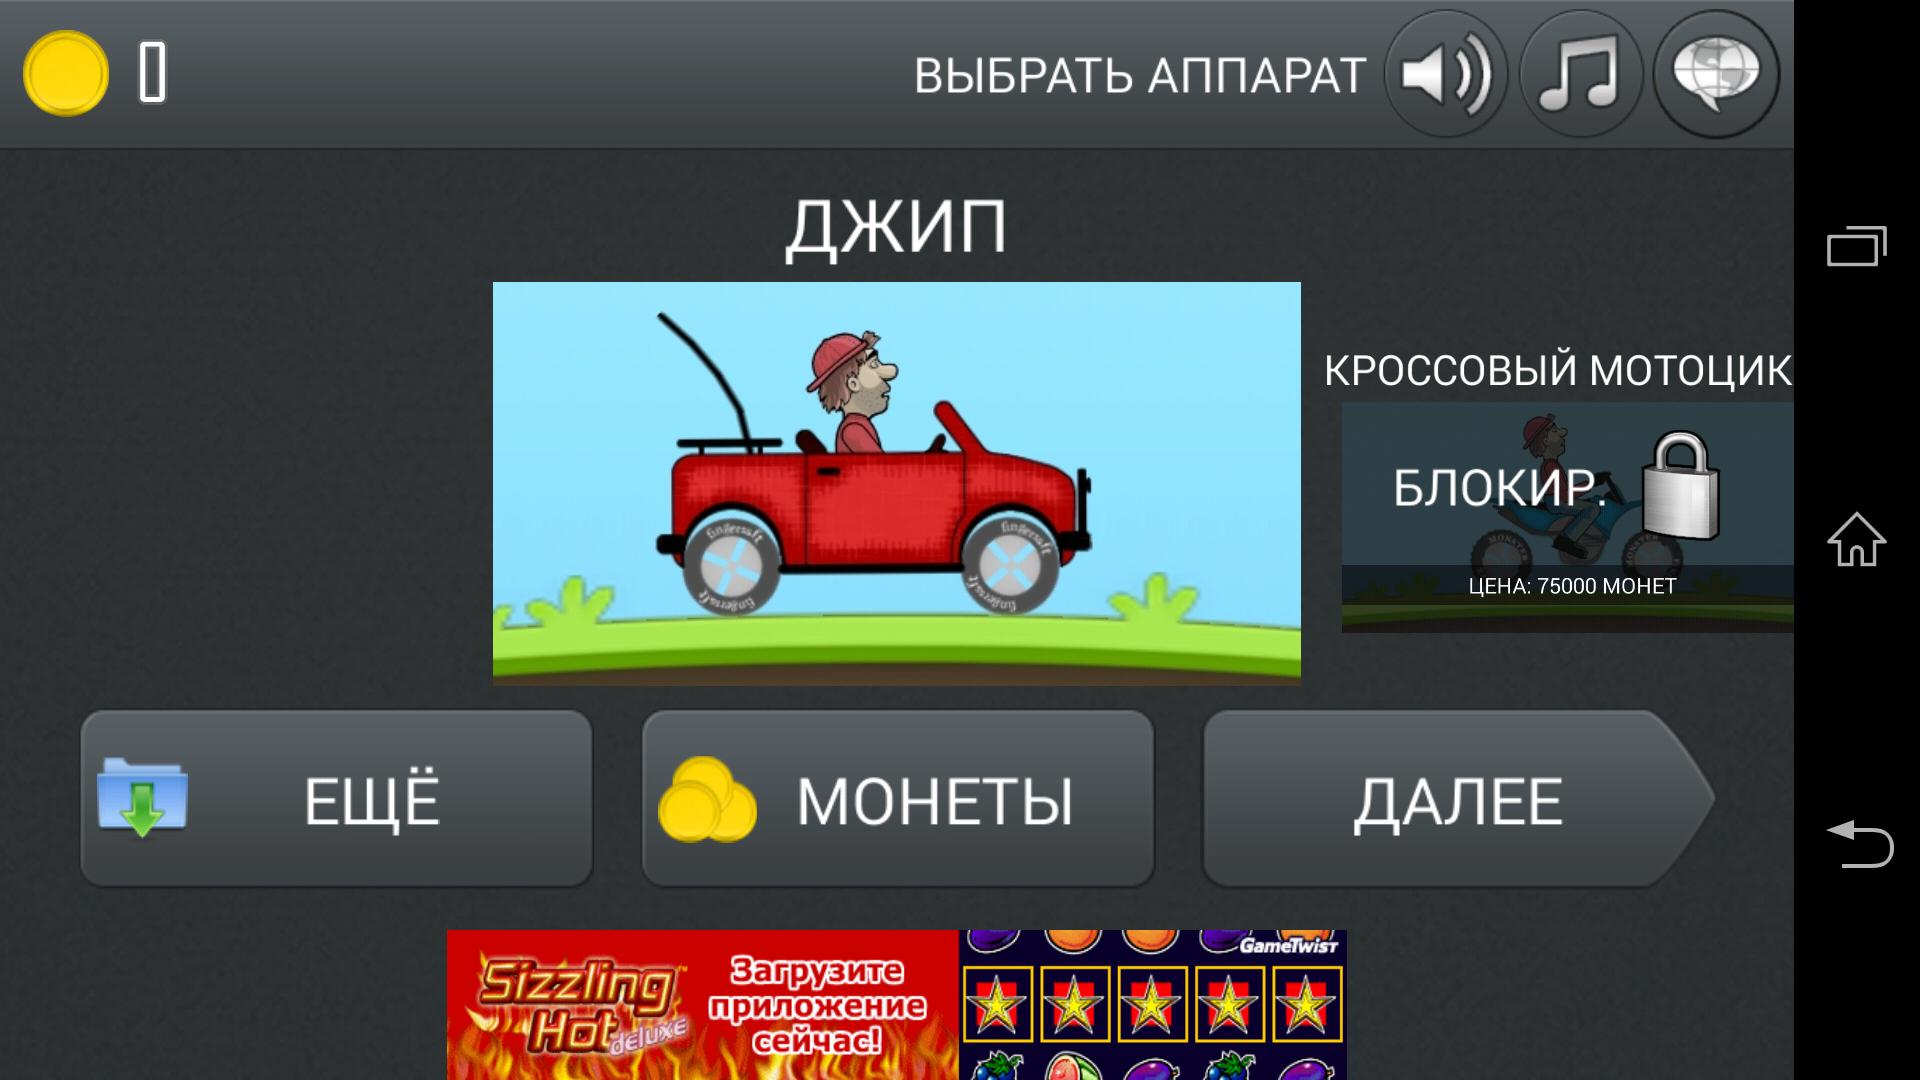 видео игра по бездорожью на грузовиках